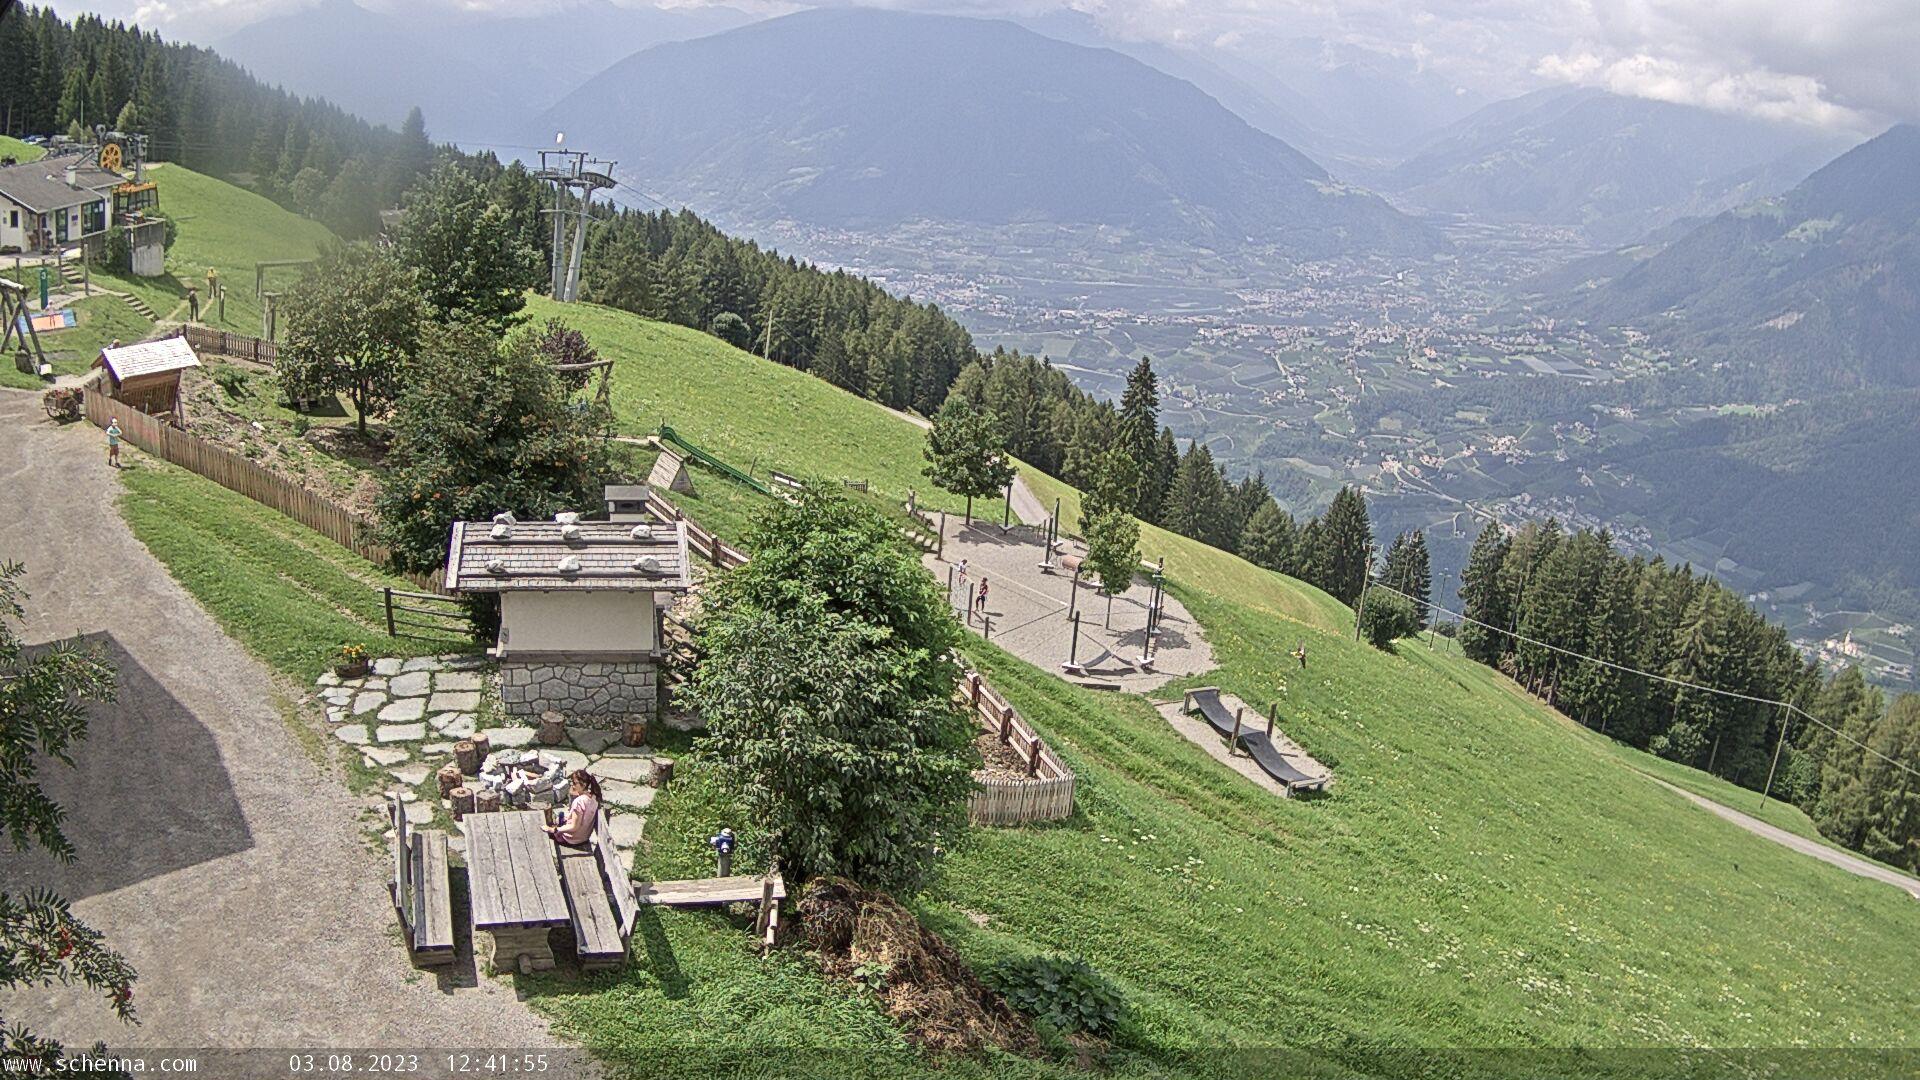 Taser - Monte Scena - Vista direzione Val Venosta